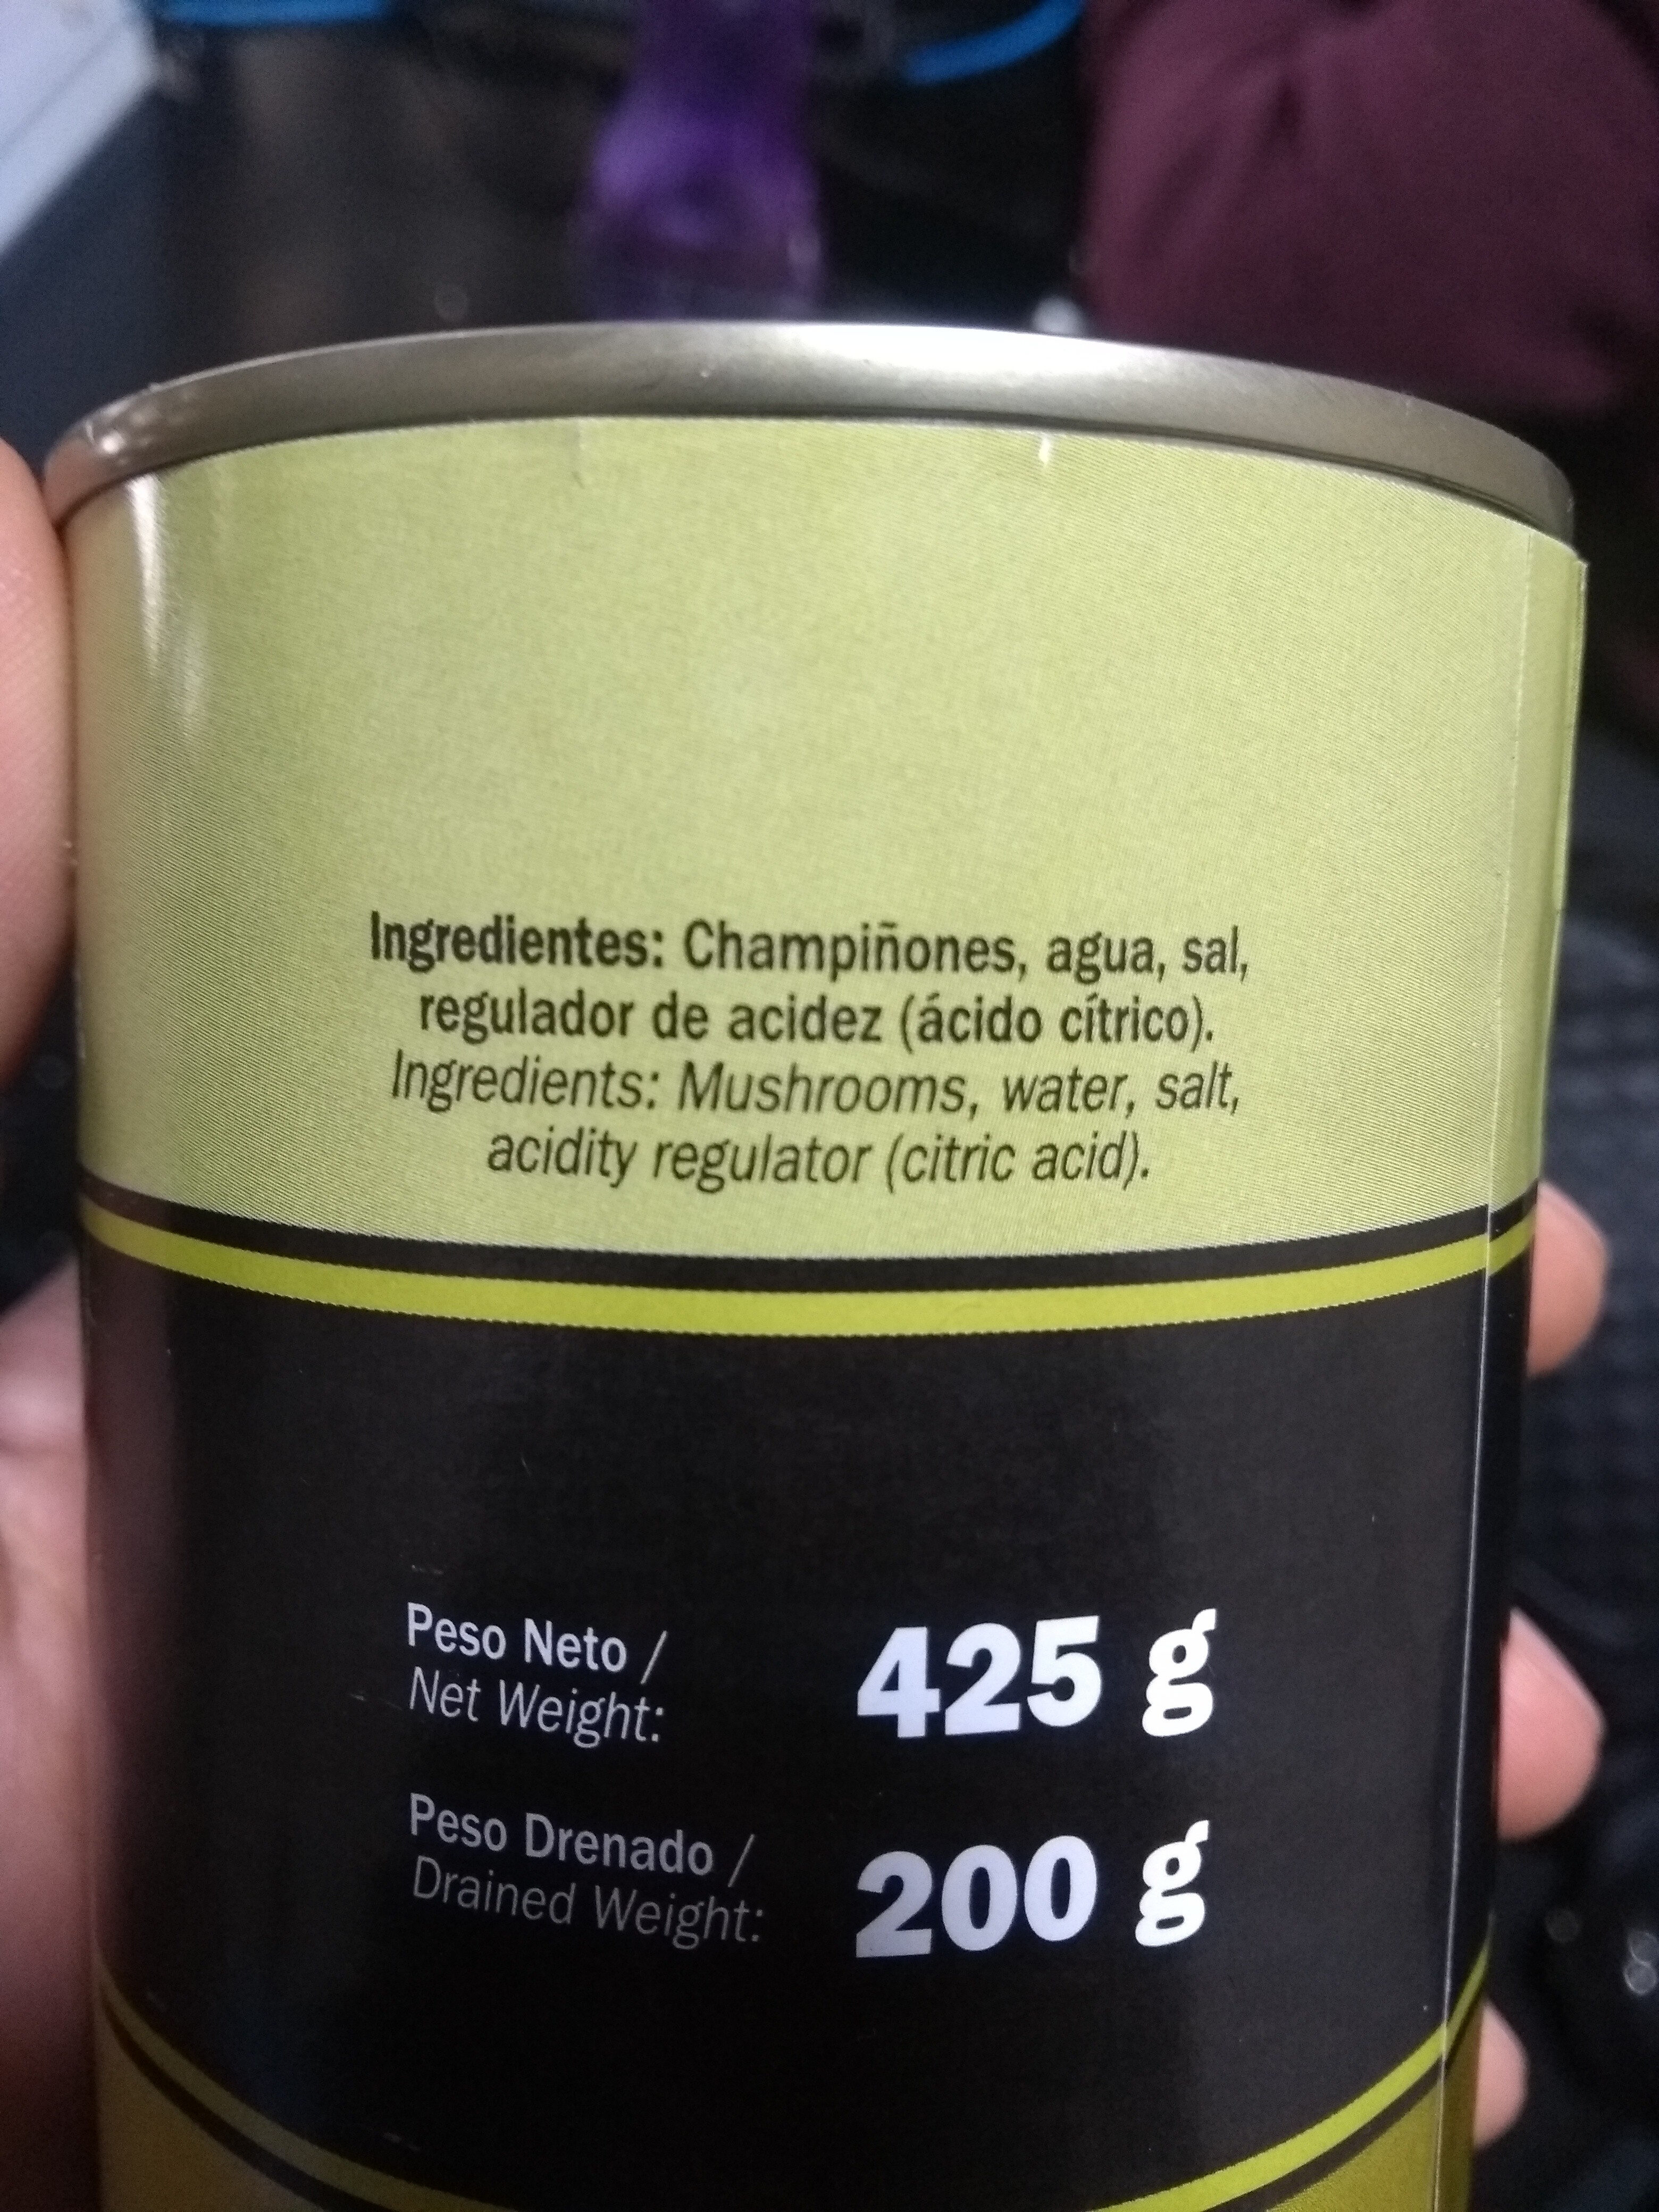 Champiñones en rebanadas en agua y sal - Ingredients - es